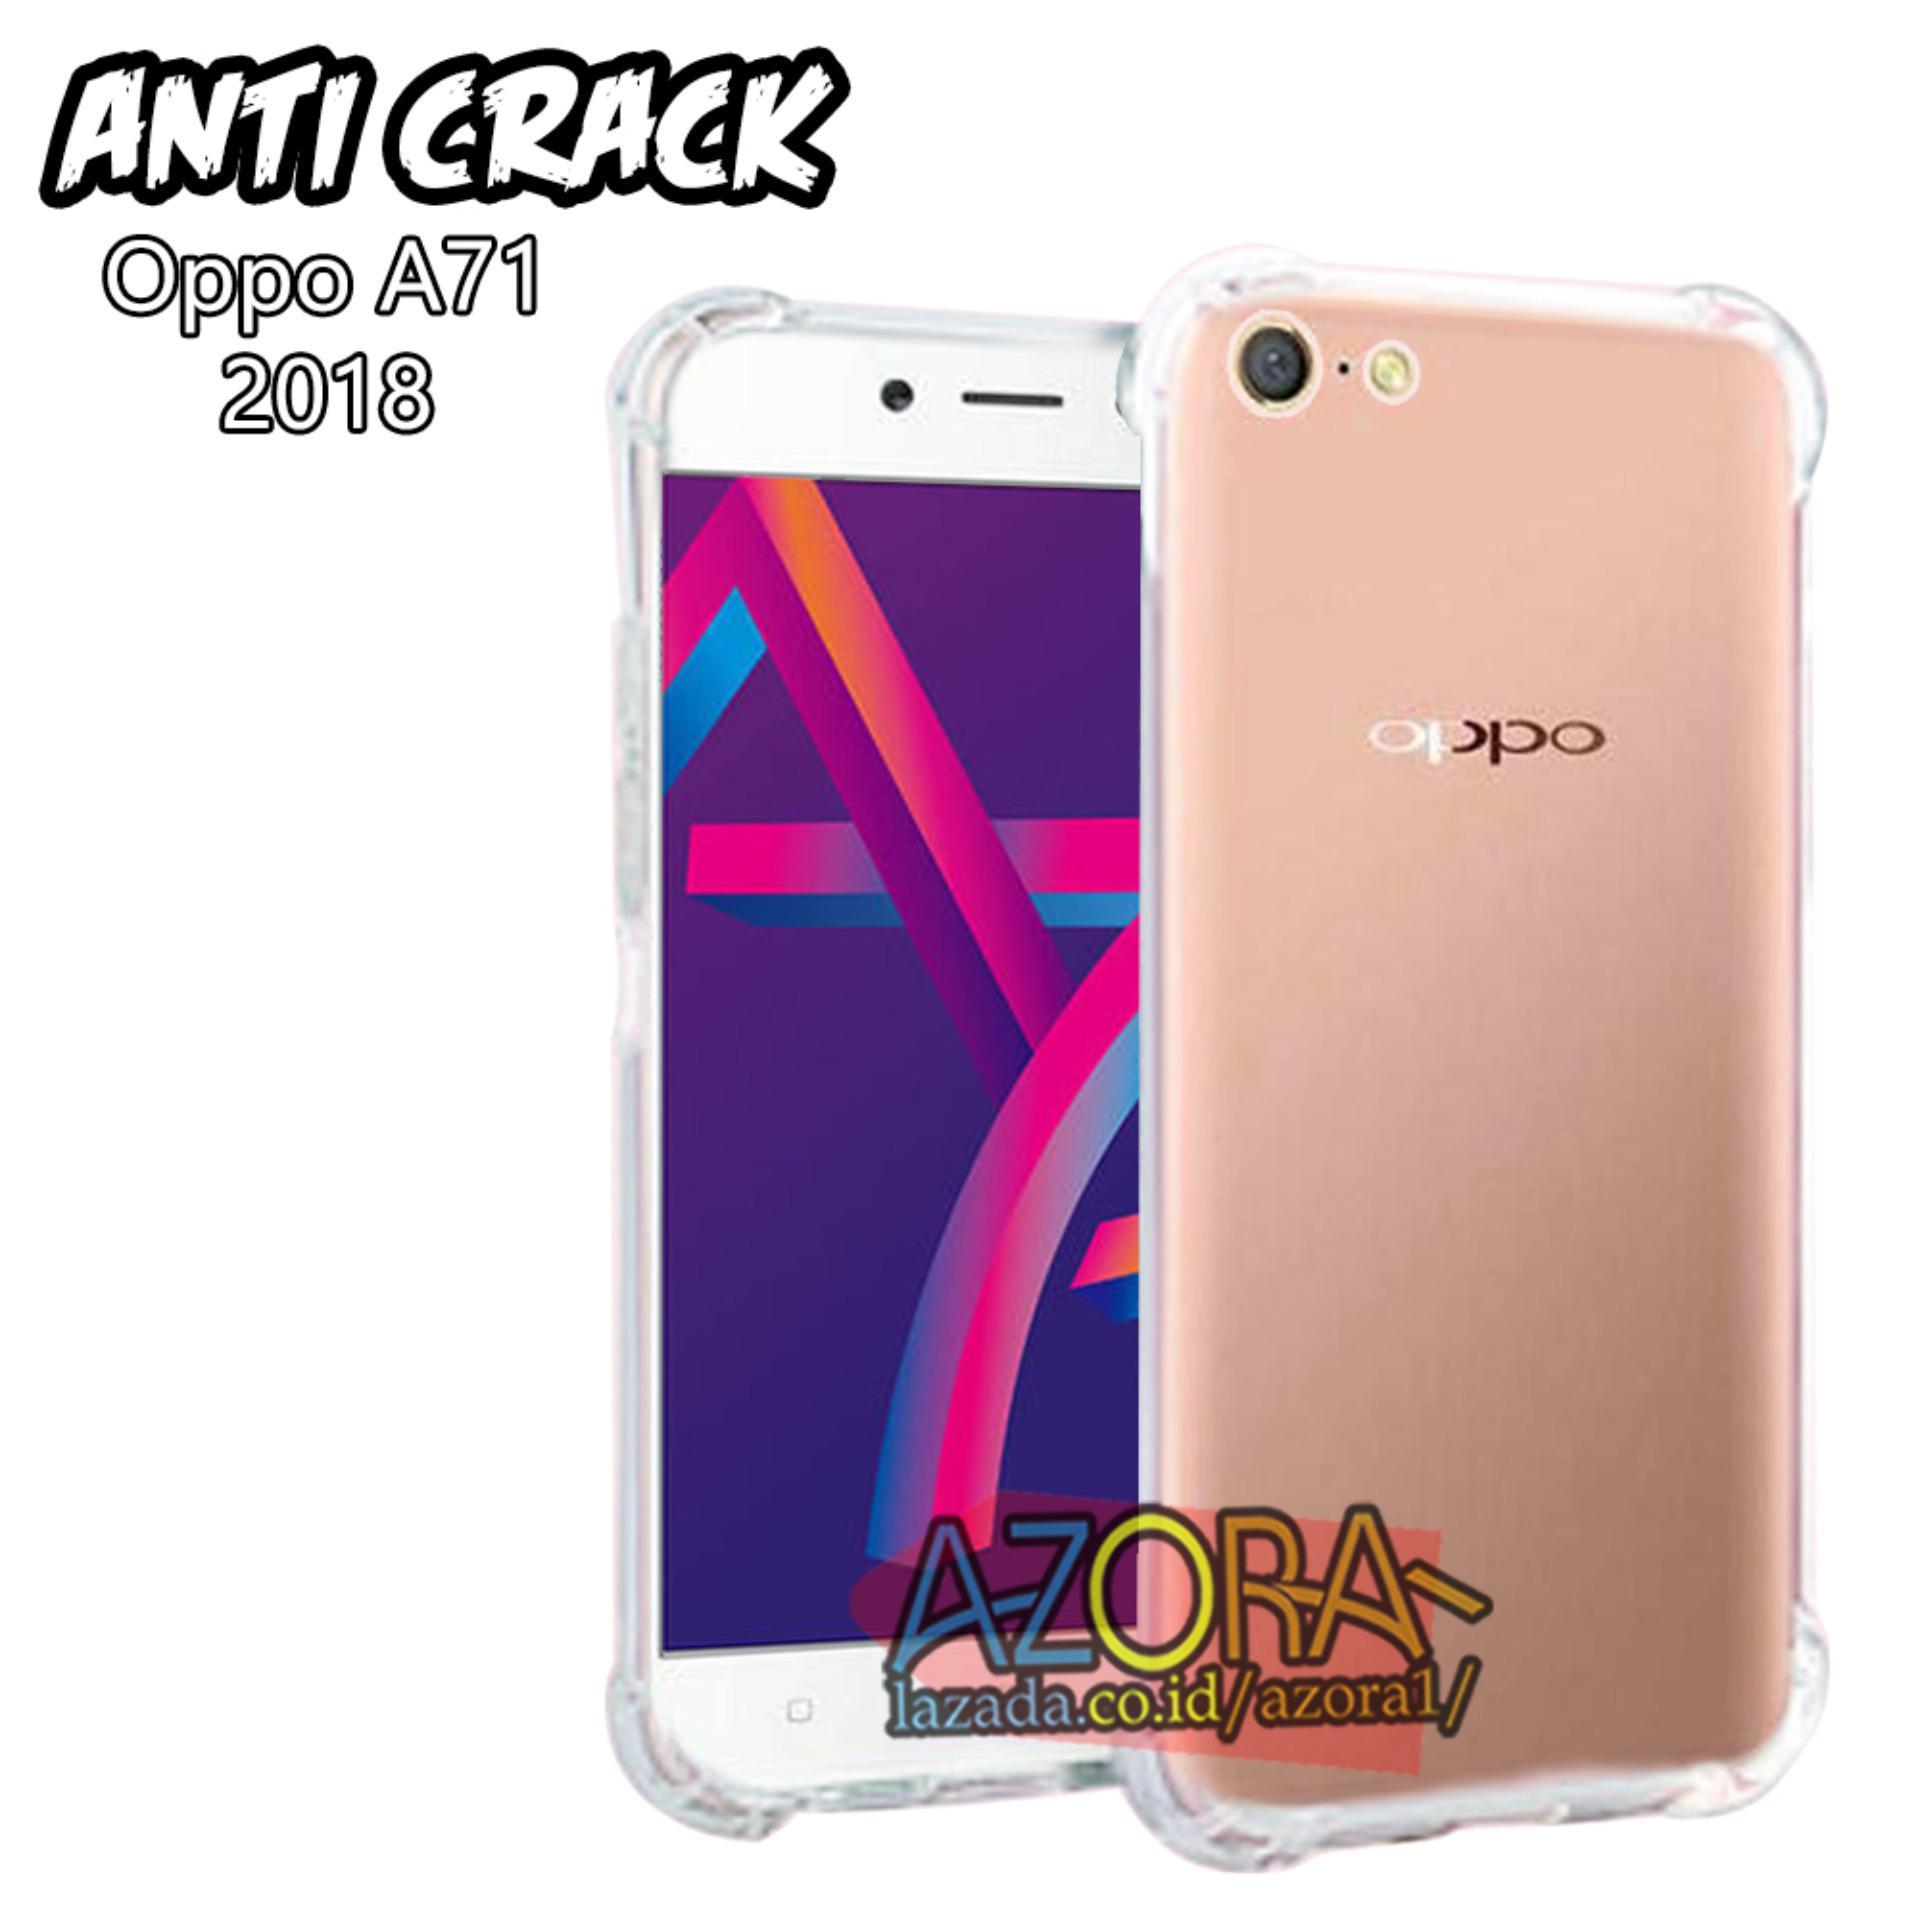 Case Anti Crack Oppo A71 2018 Ultra Thin Anti Shock Jelly Silikon Shockproof Softcase Azora - Bening